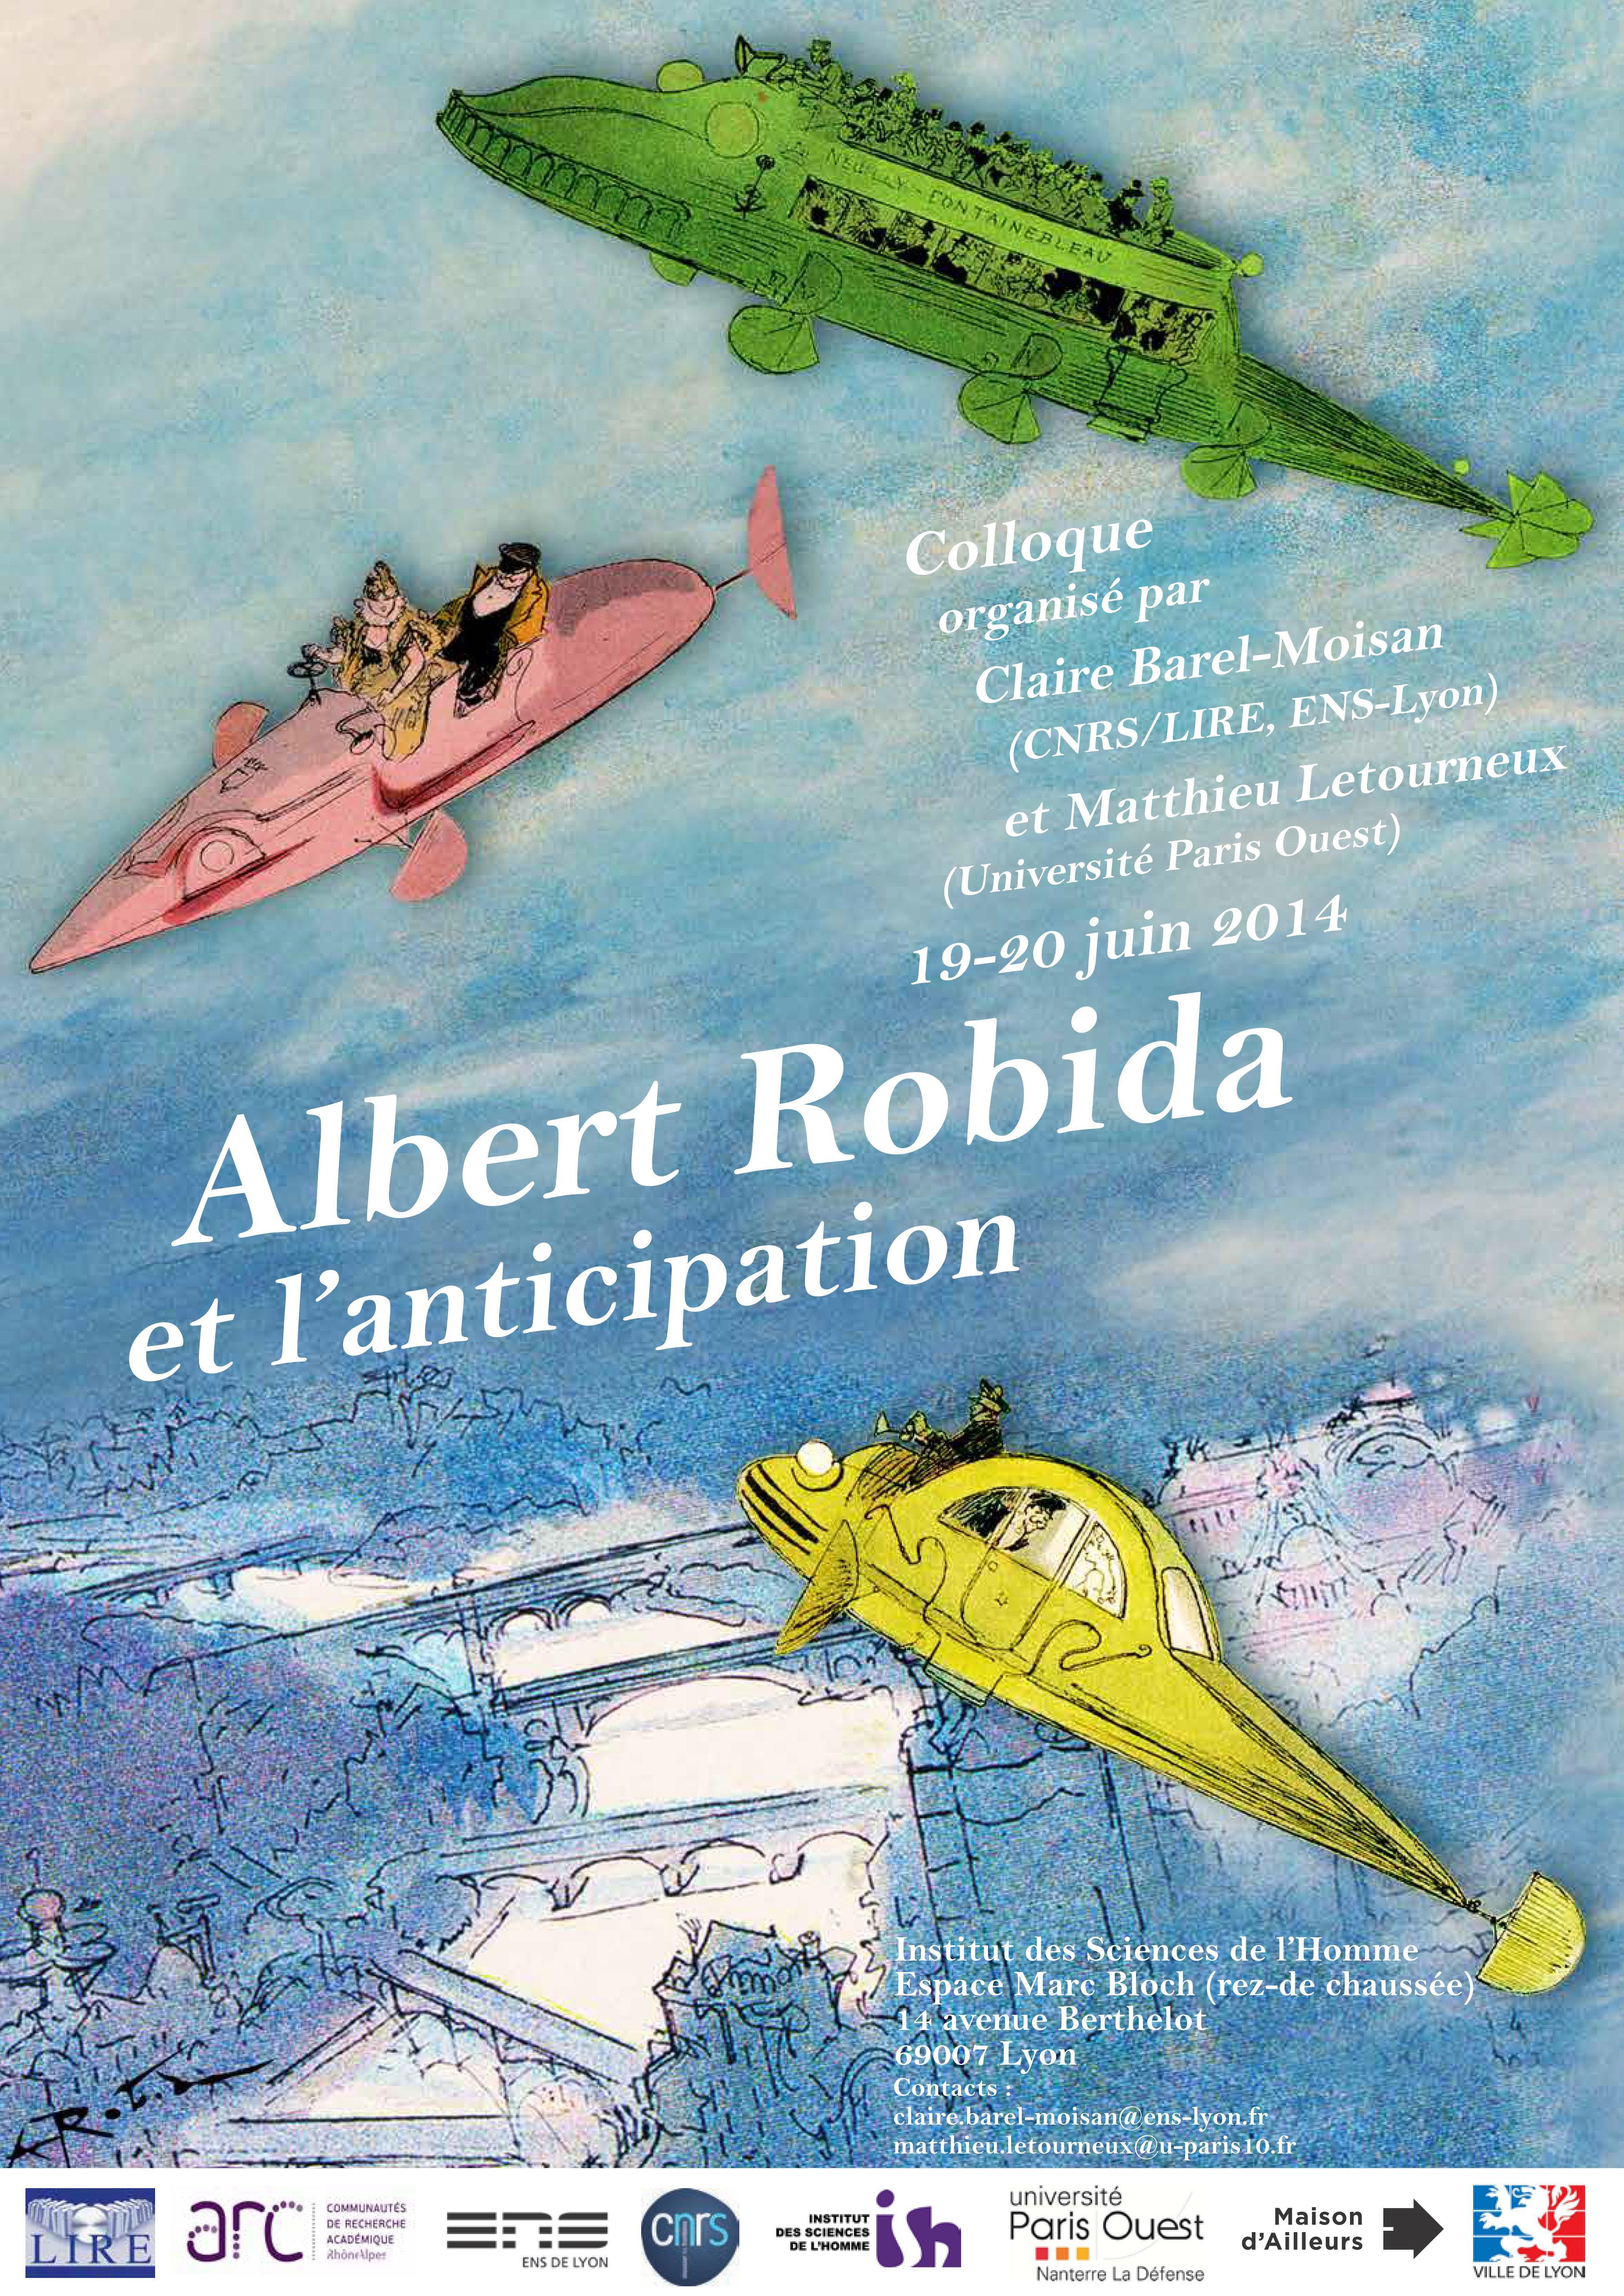 Albert Robida et l'Anticipation (19-20 juin 2014)